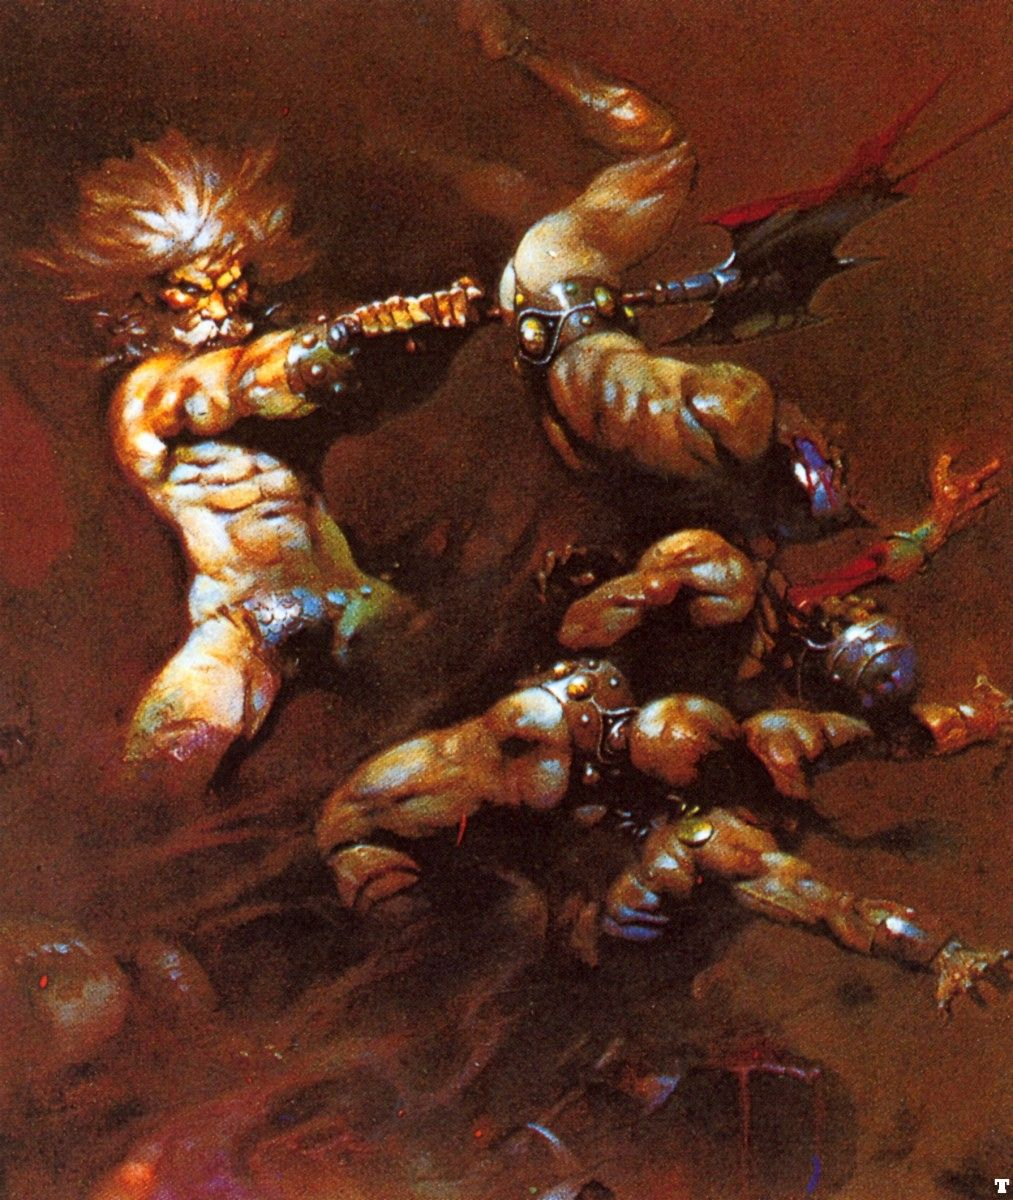 Conan of Aquilonia - Frank Frazetta | Artist - Frank ...